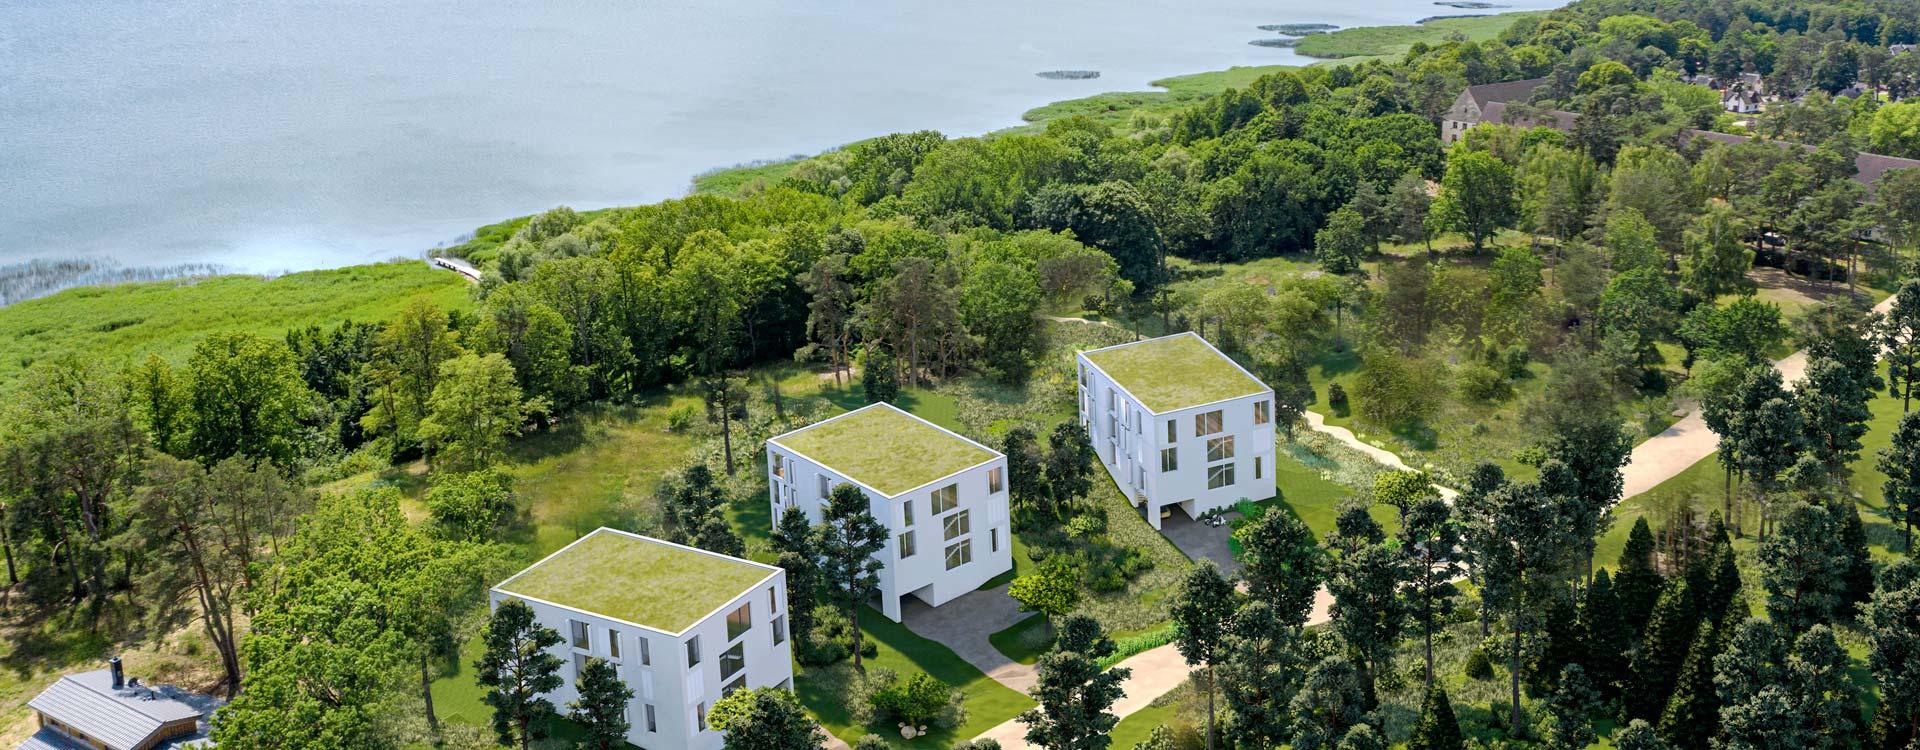 Neubauprojekt auf Usedom